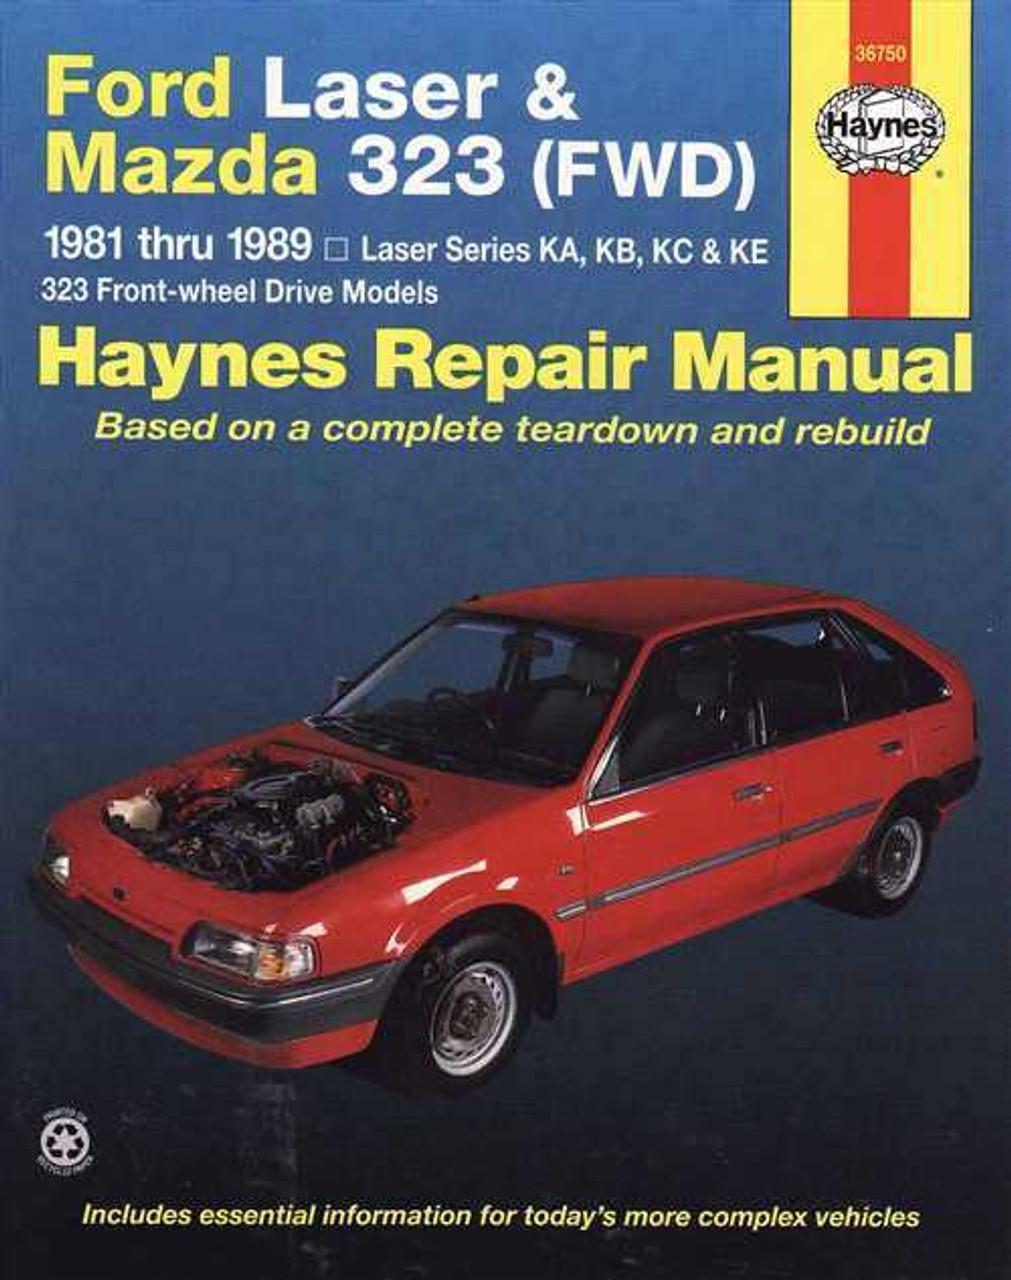 ford laser amp mazda 323 1981 1989 workshop manual rh automotobookshop com au Mazda Familia S-Wagon Mazda Familia S-Wagon